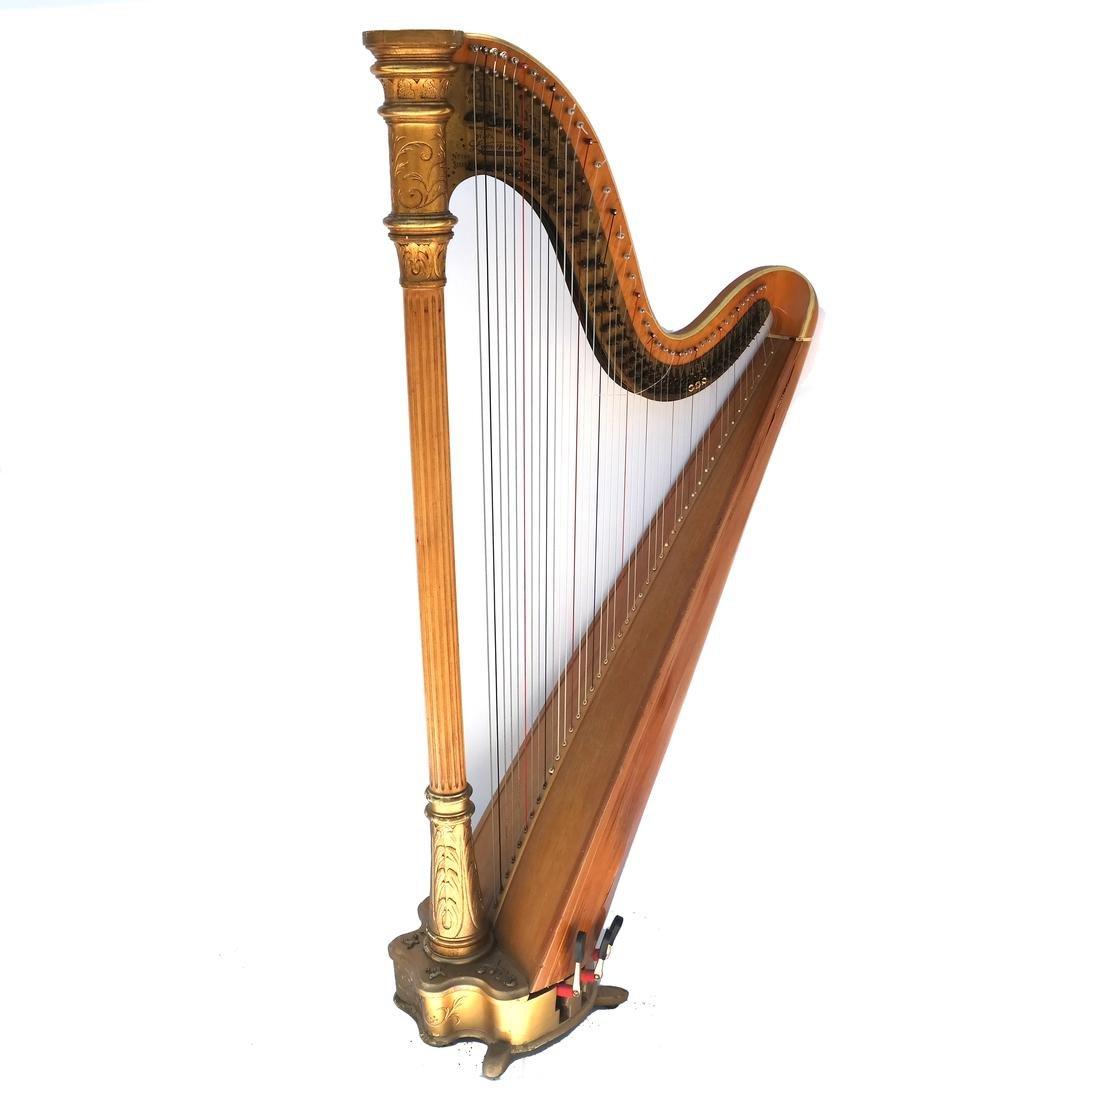 Lyon & Healy Harp, No. 148, Style H